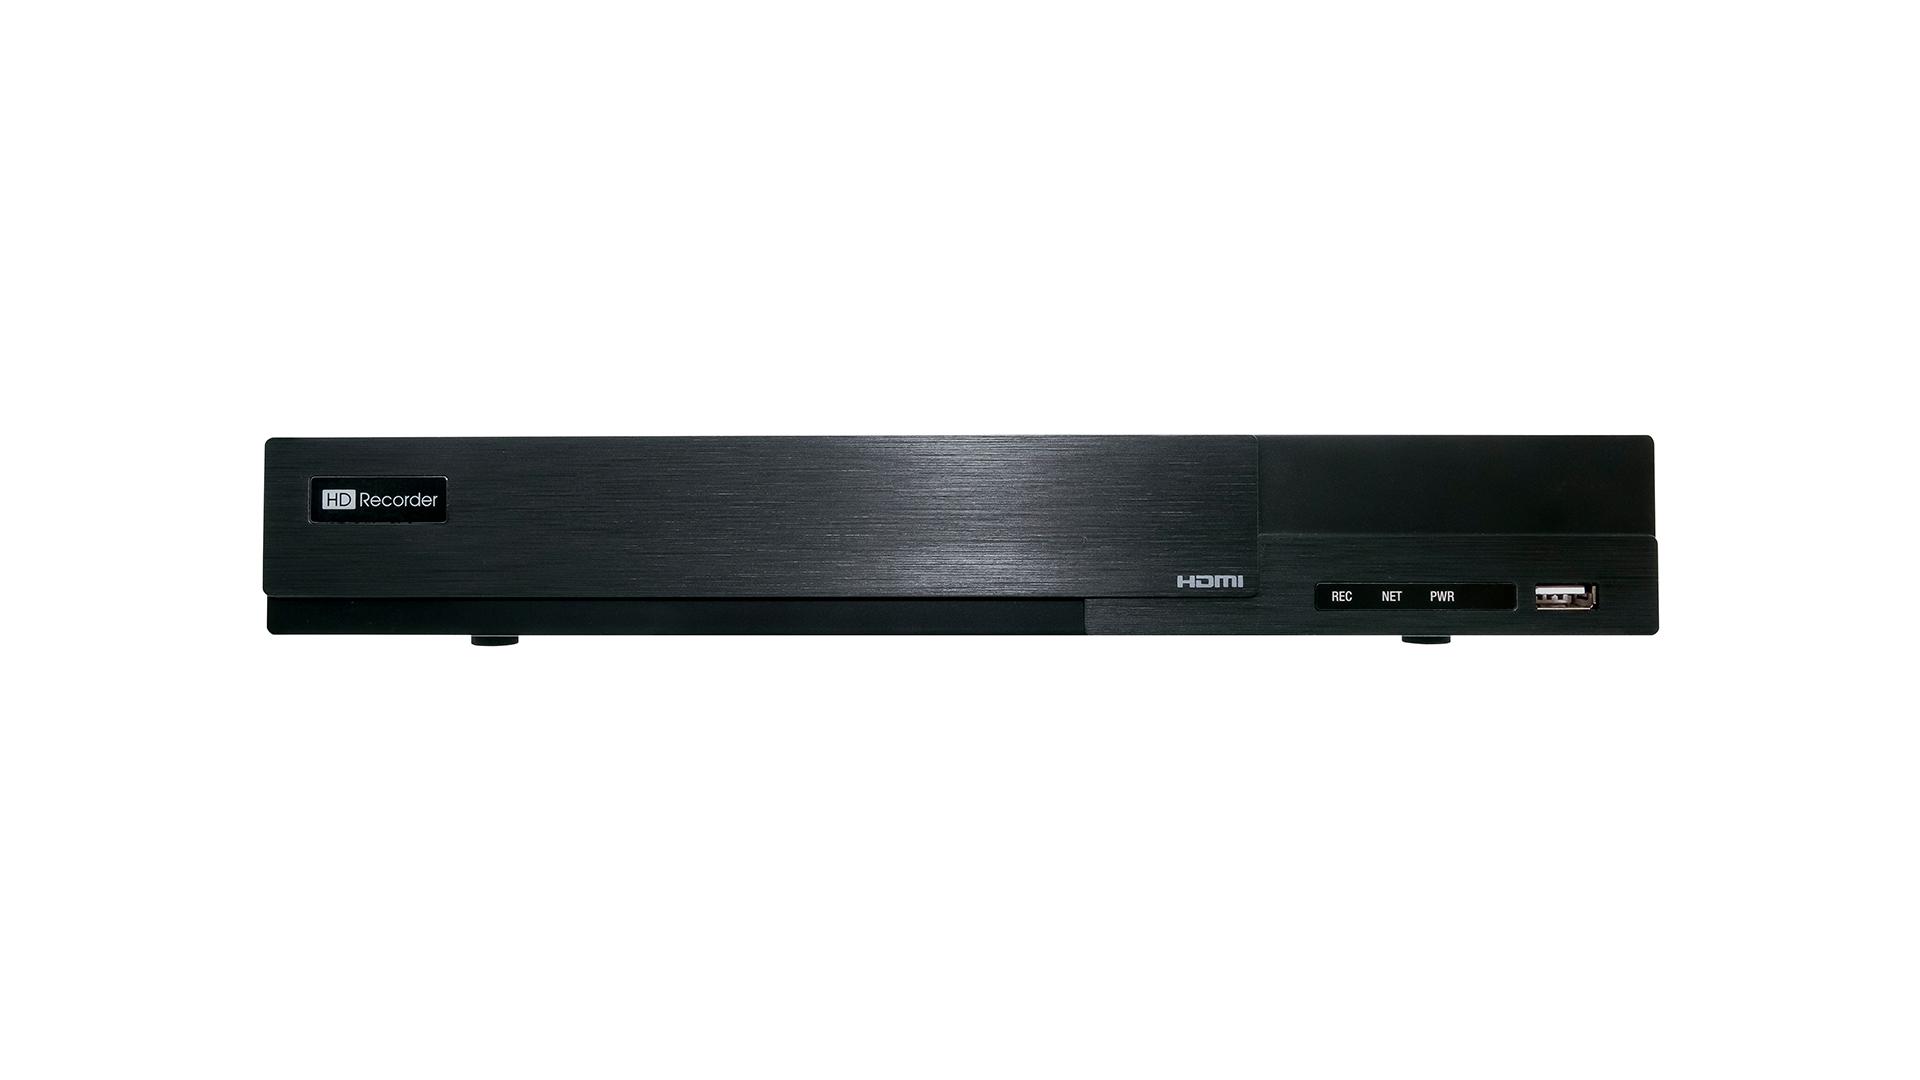 8chハードディスクネットワークビデオレコーダー